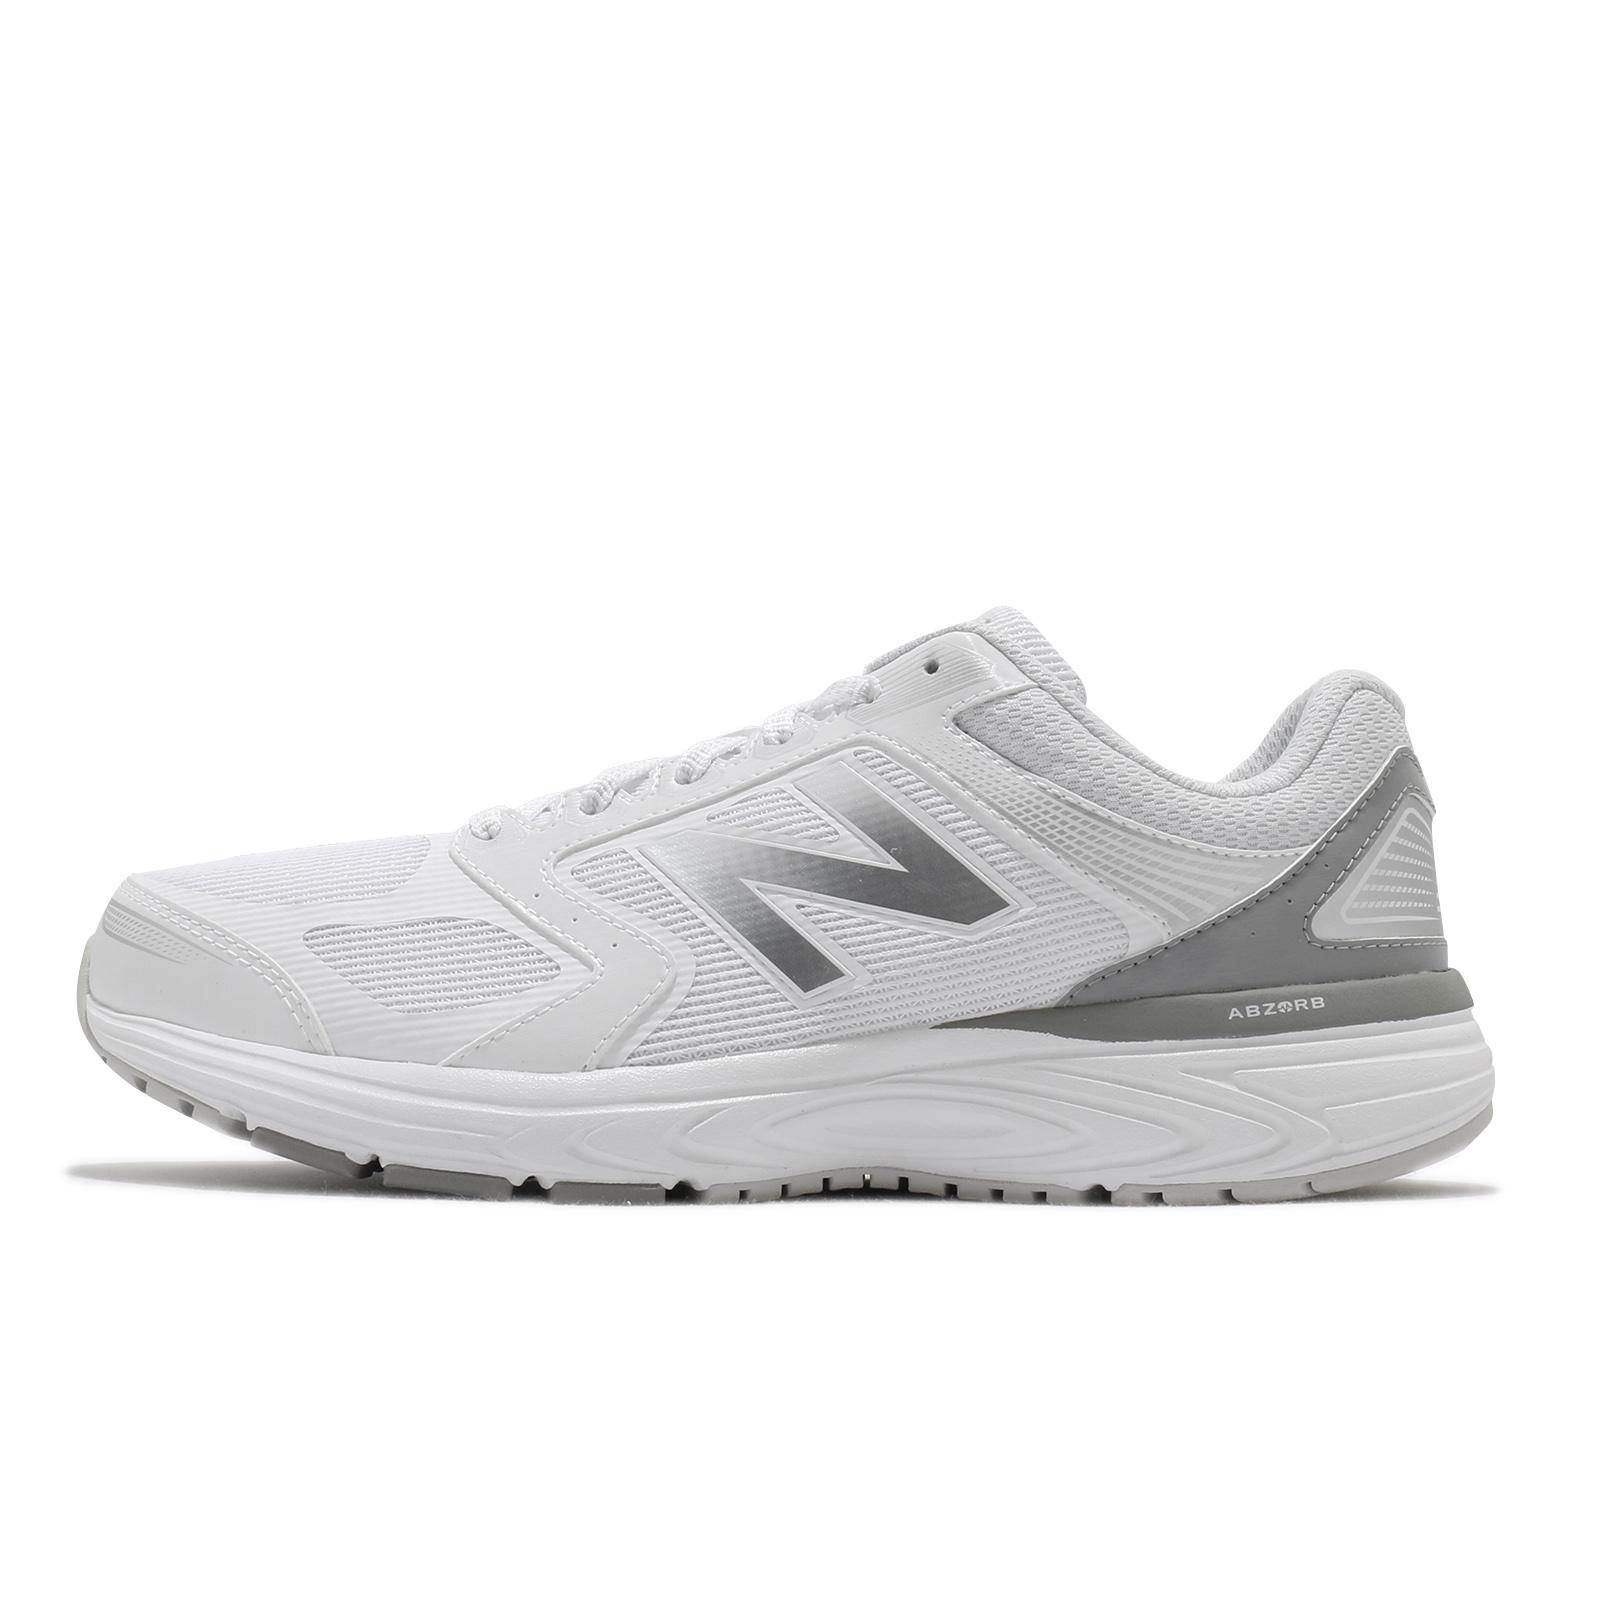 New Balance 565 寬楦 白 銀 NB 路跑 運動鞋 慢跑鞋 【ACS】 ME565SK7 2E